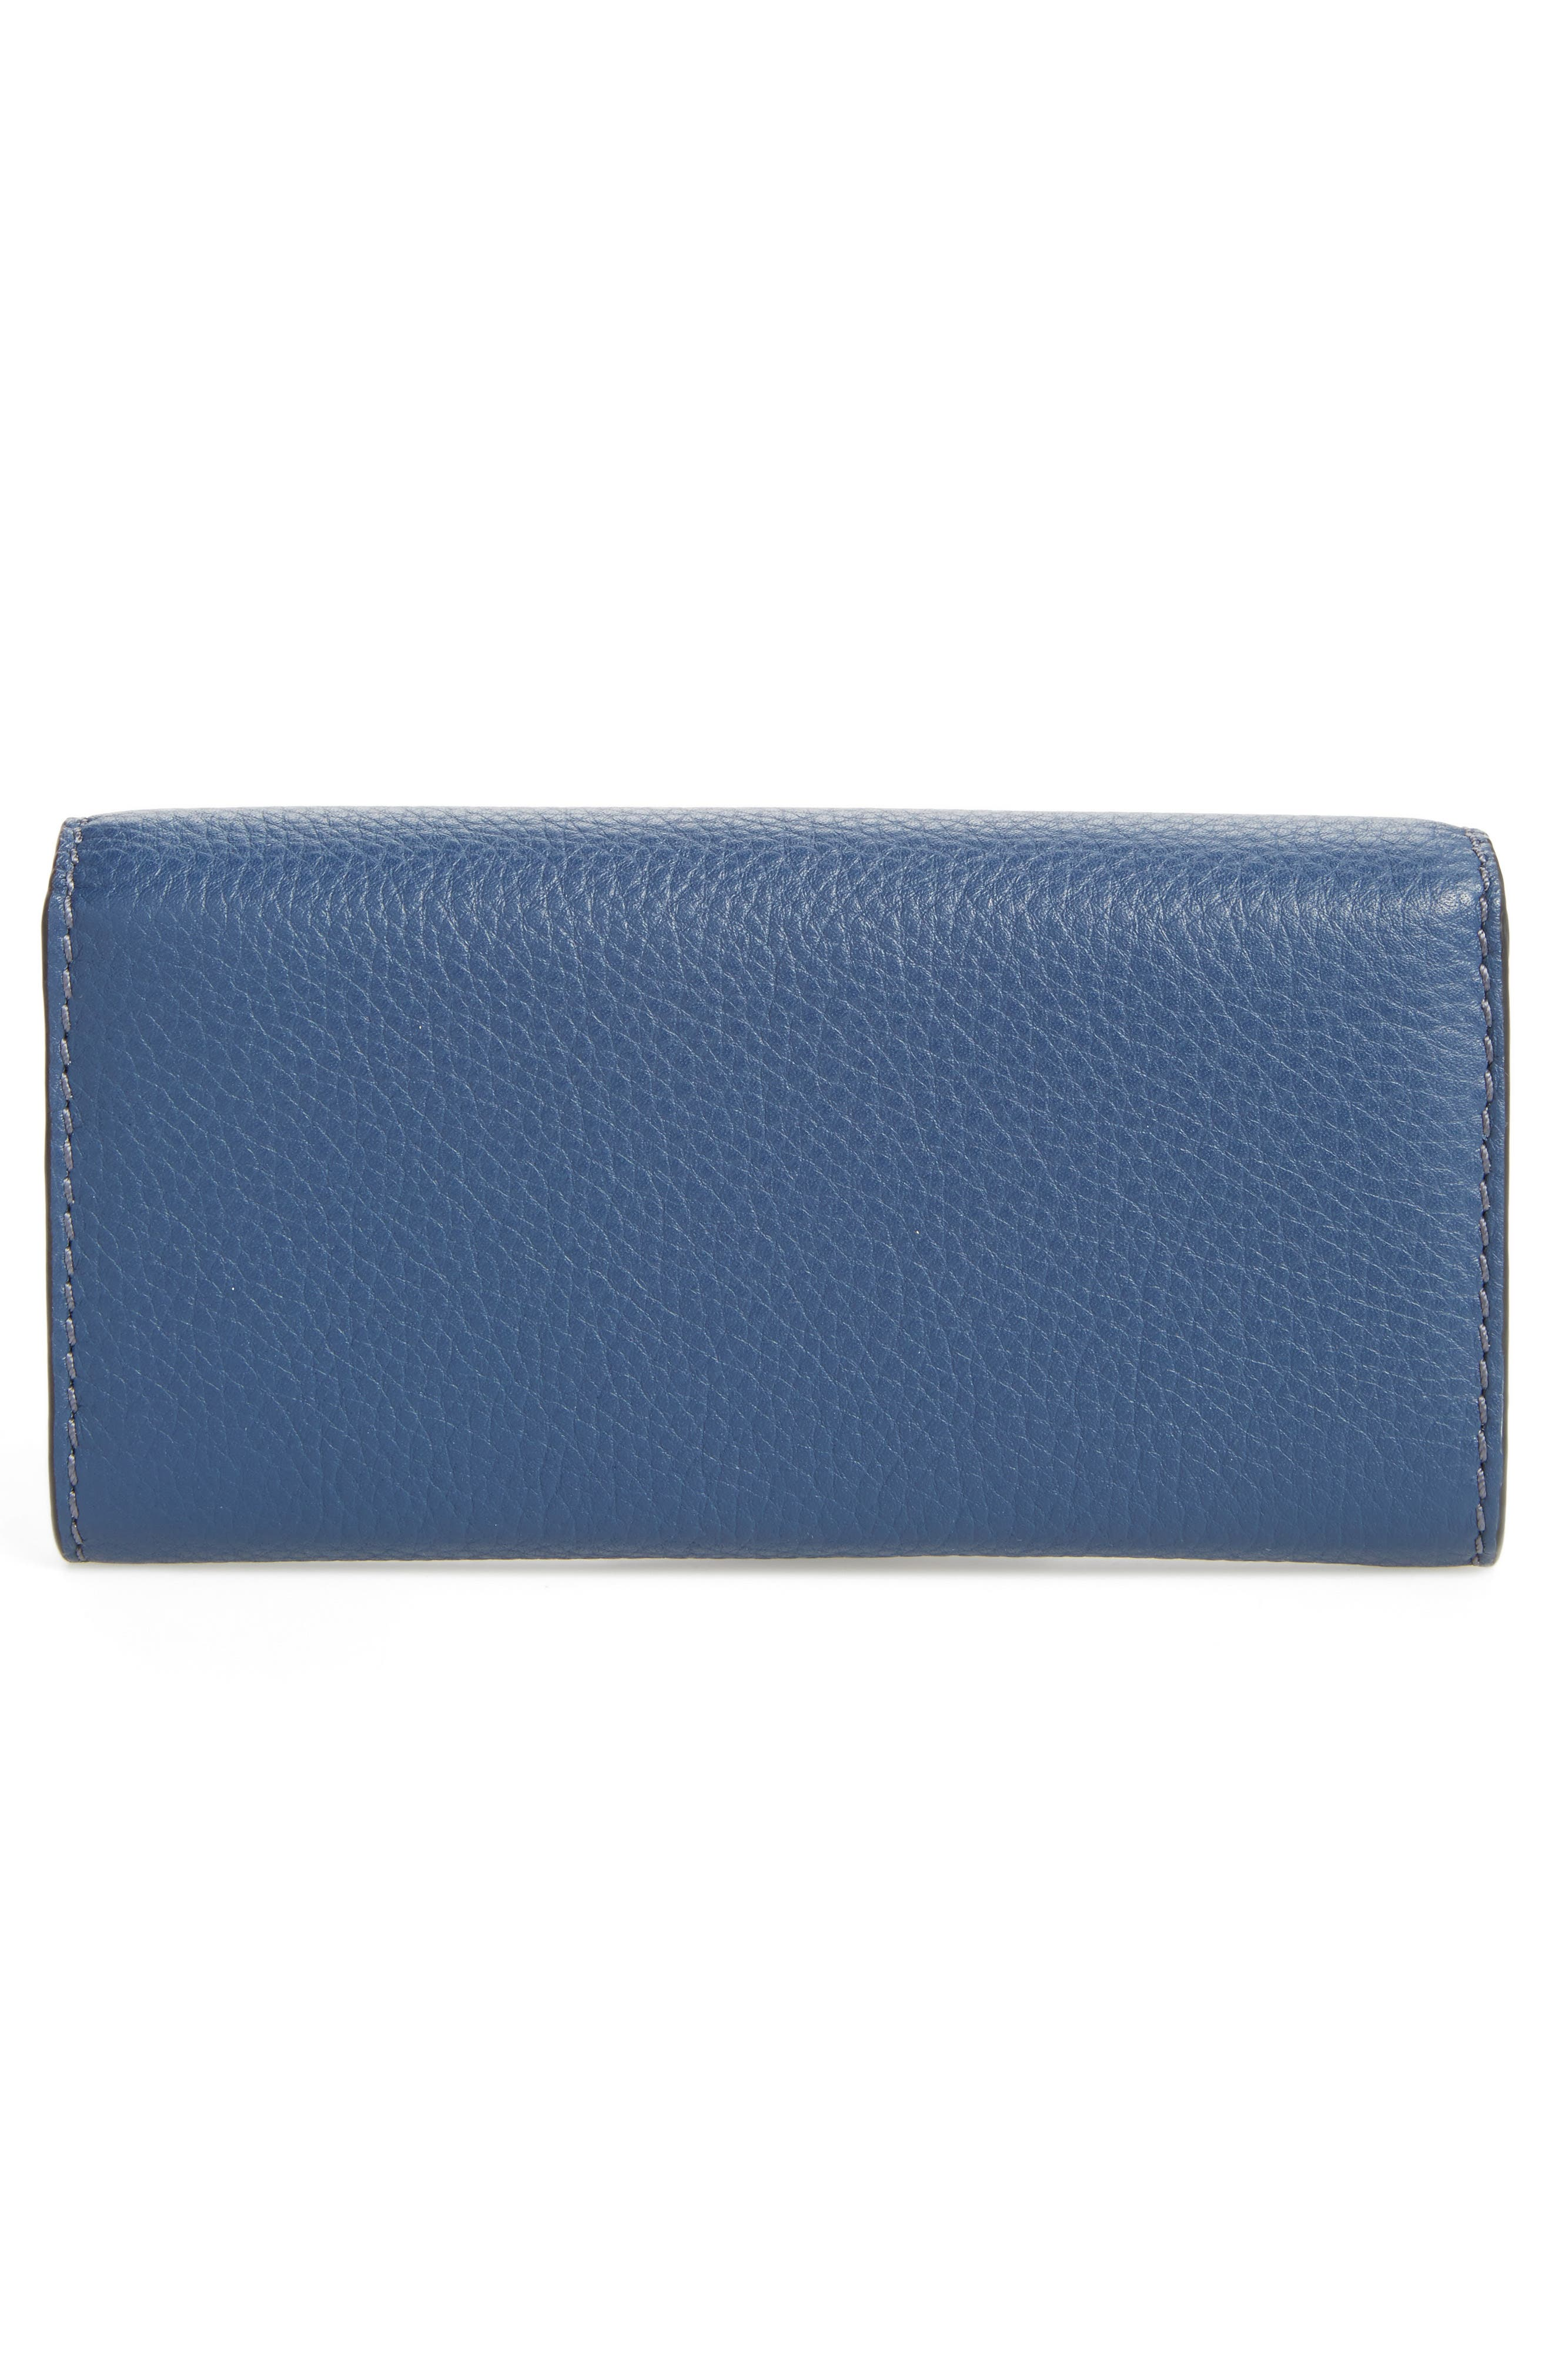 Alternate Image 2  - Chloé 'Marcie - Long' Leather Flap Wallet